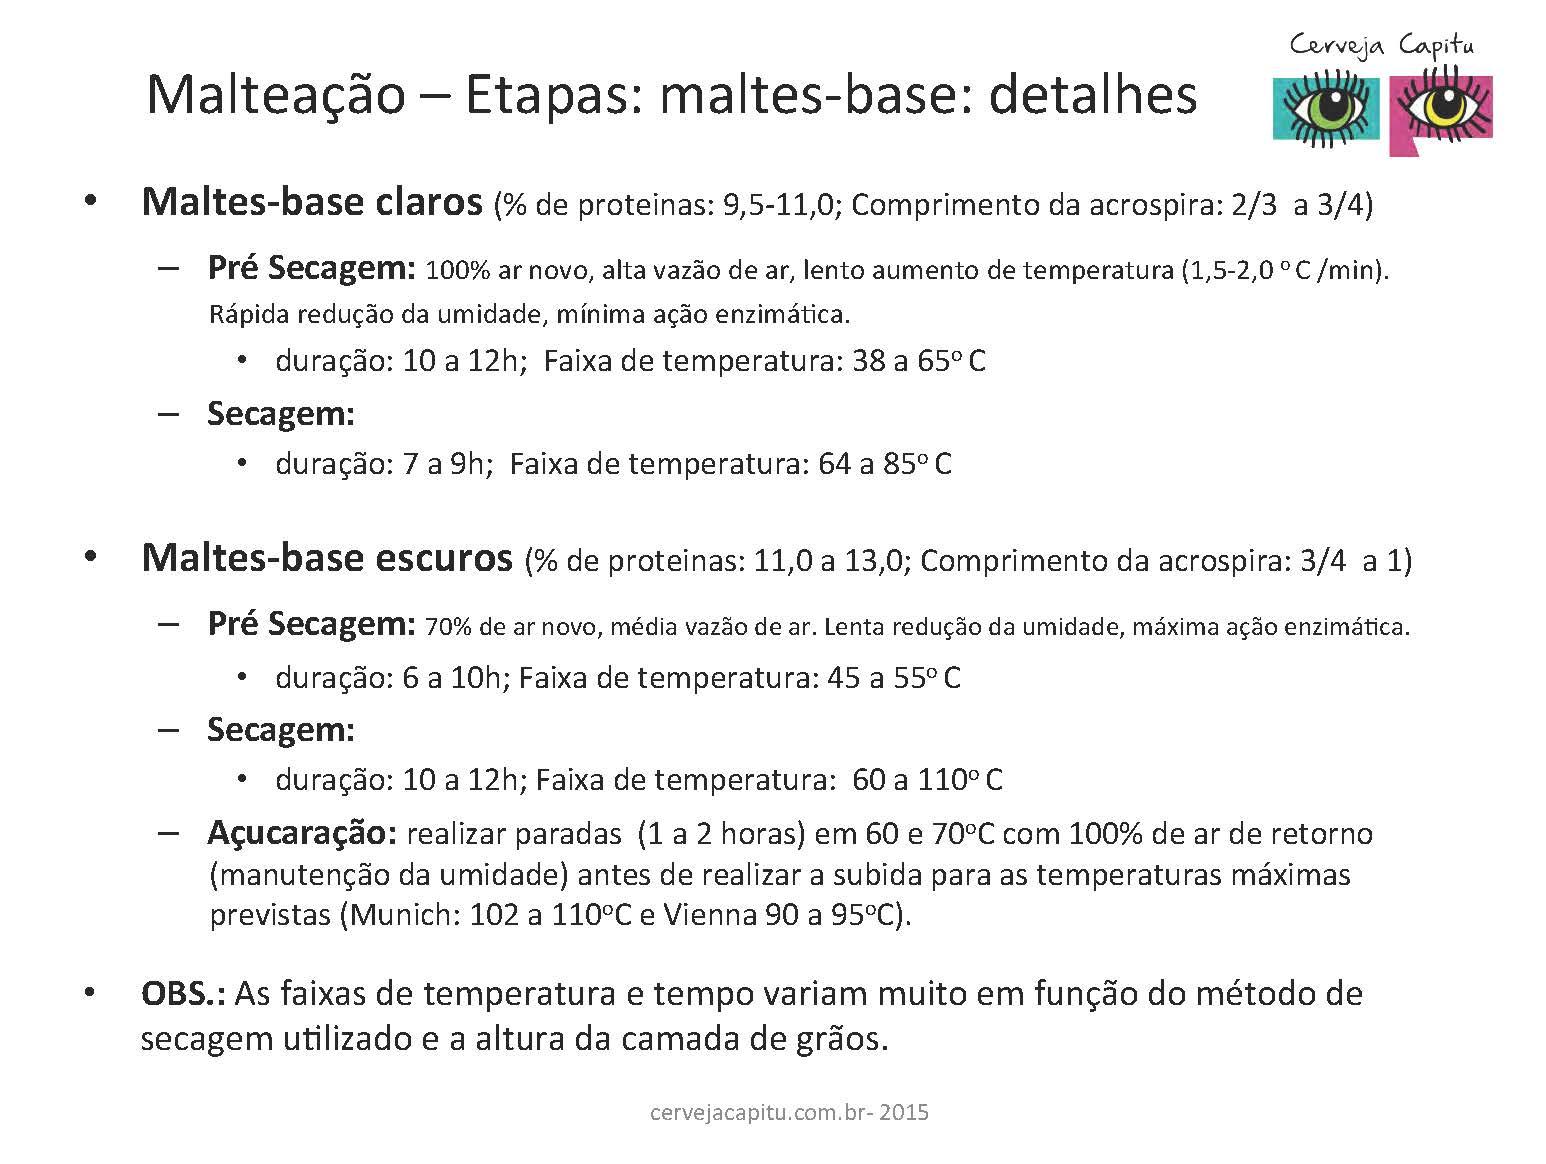 Princípios da Malteação_Capitu_SM_Page_10.jpg